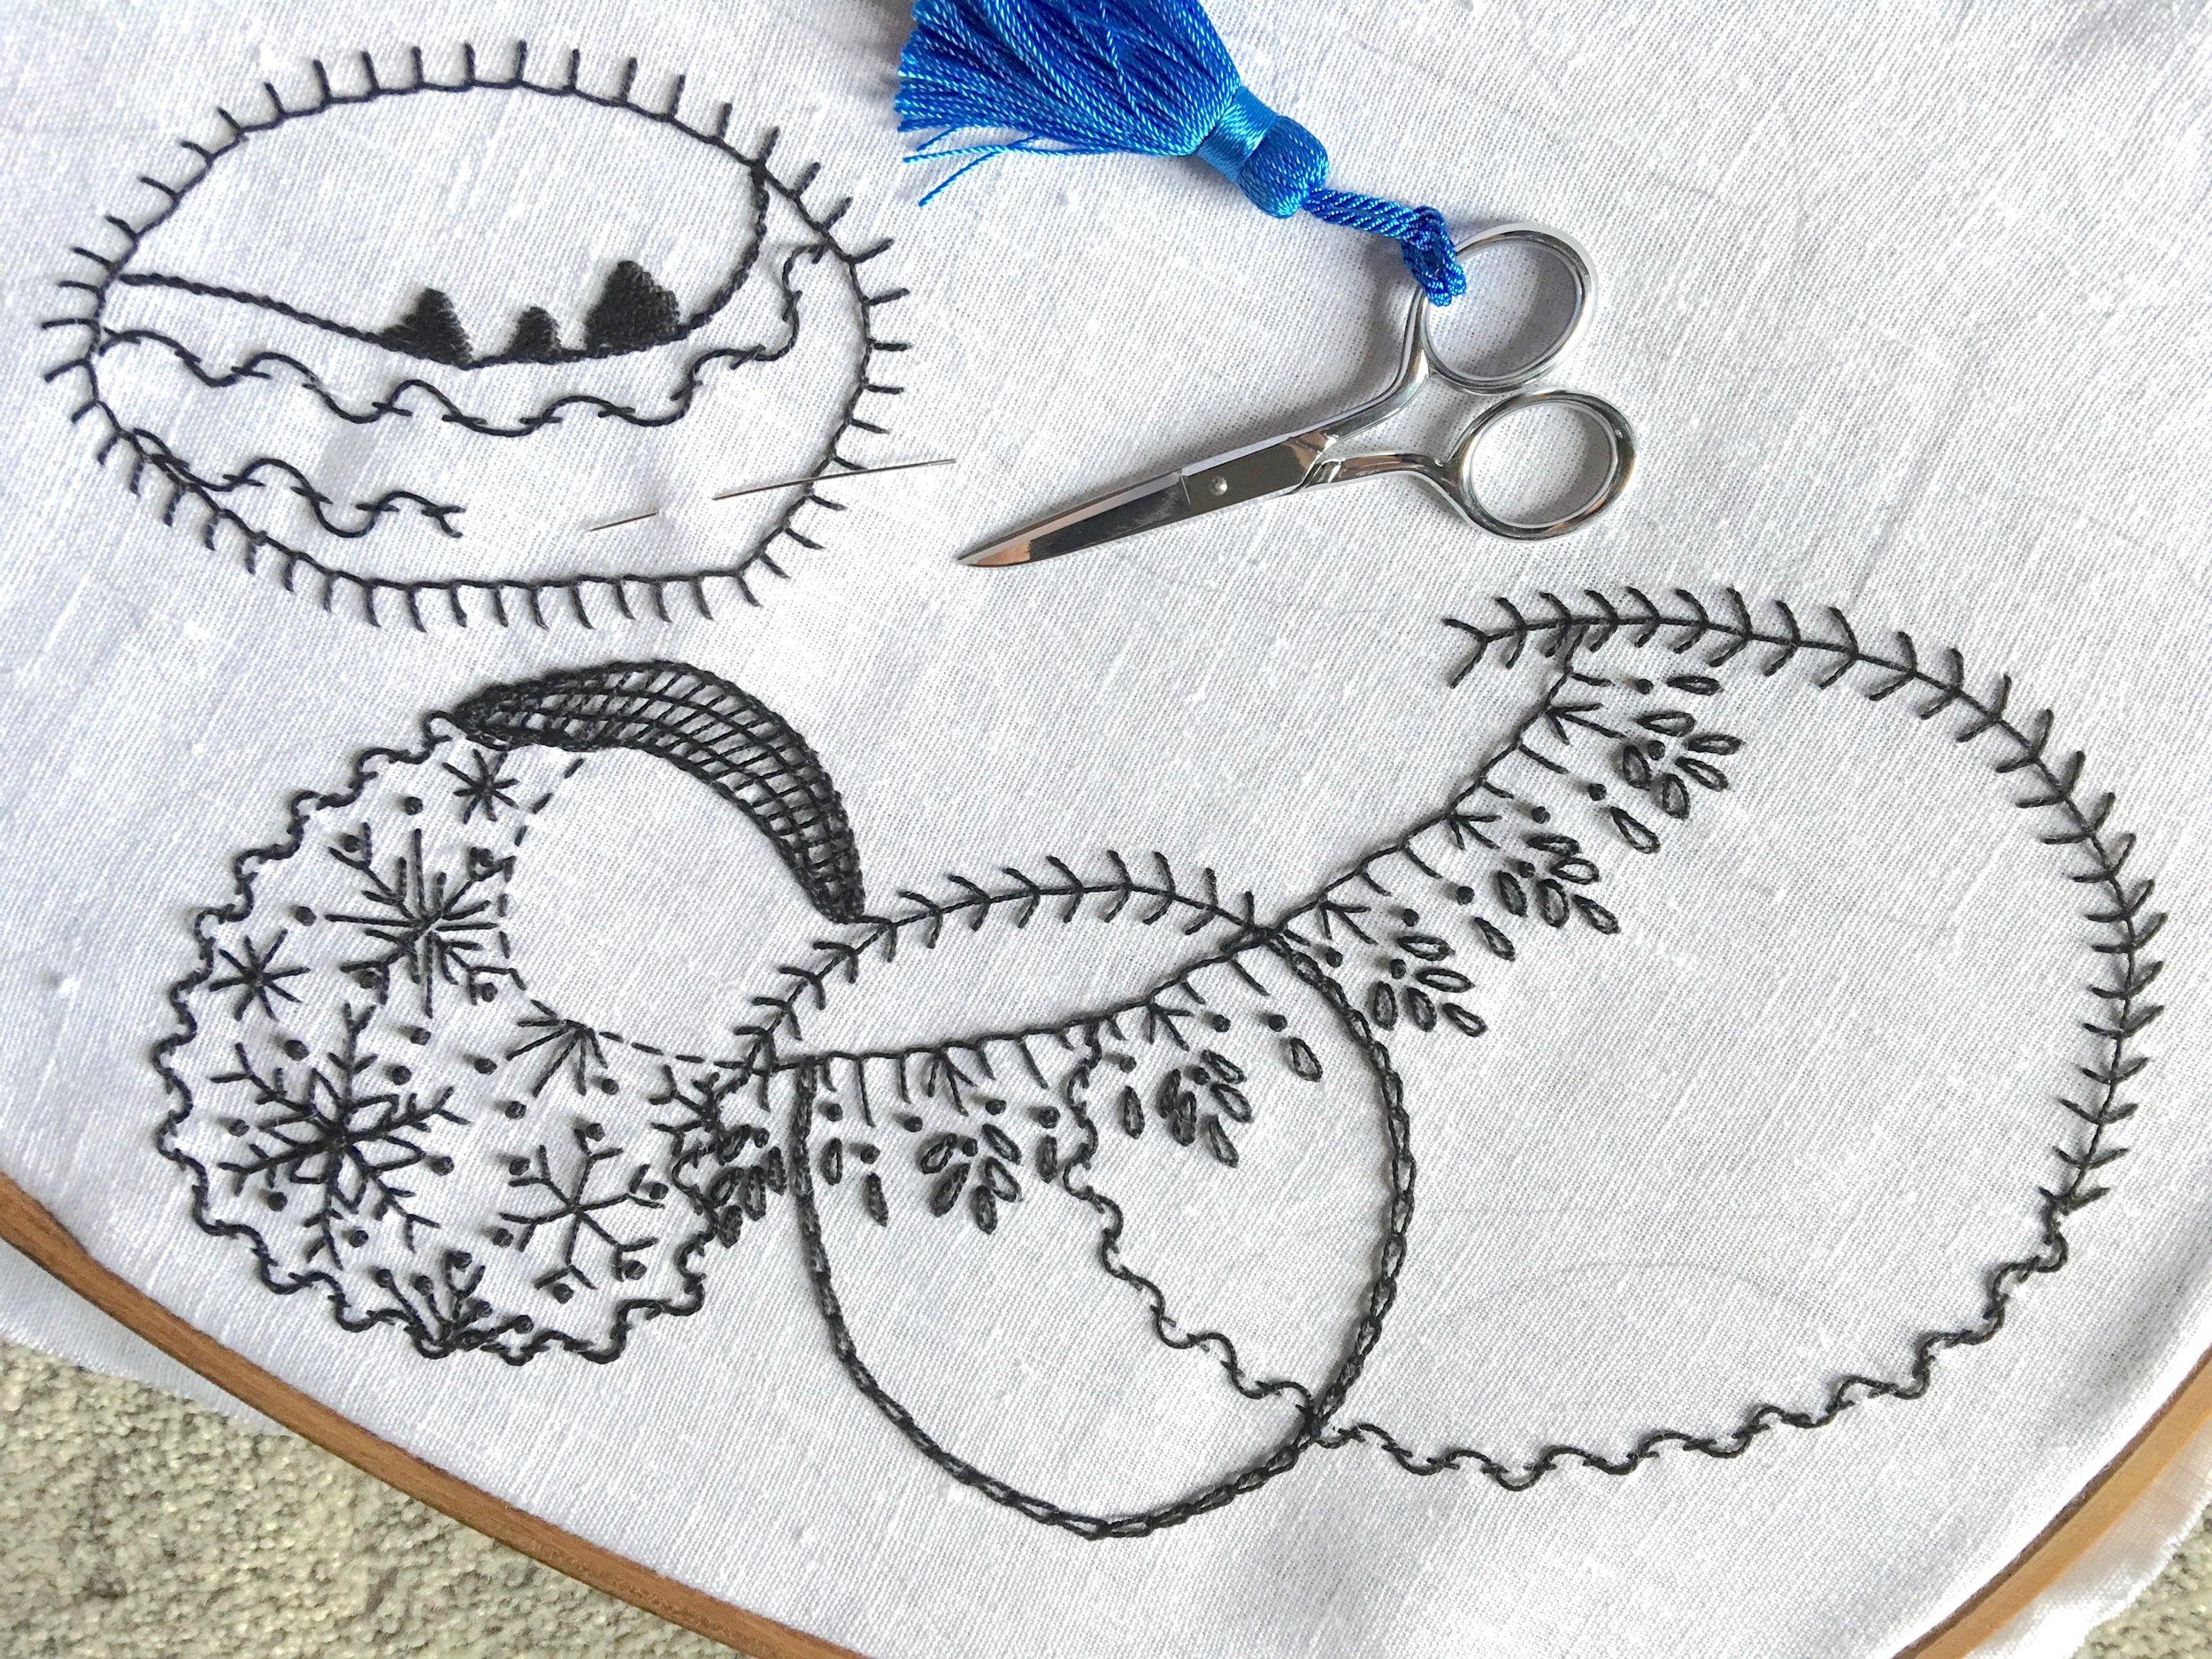 madeon23rd.com.blog.embroidery15.jpg